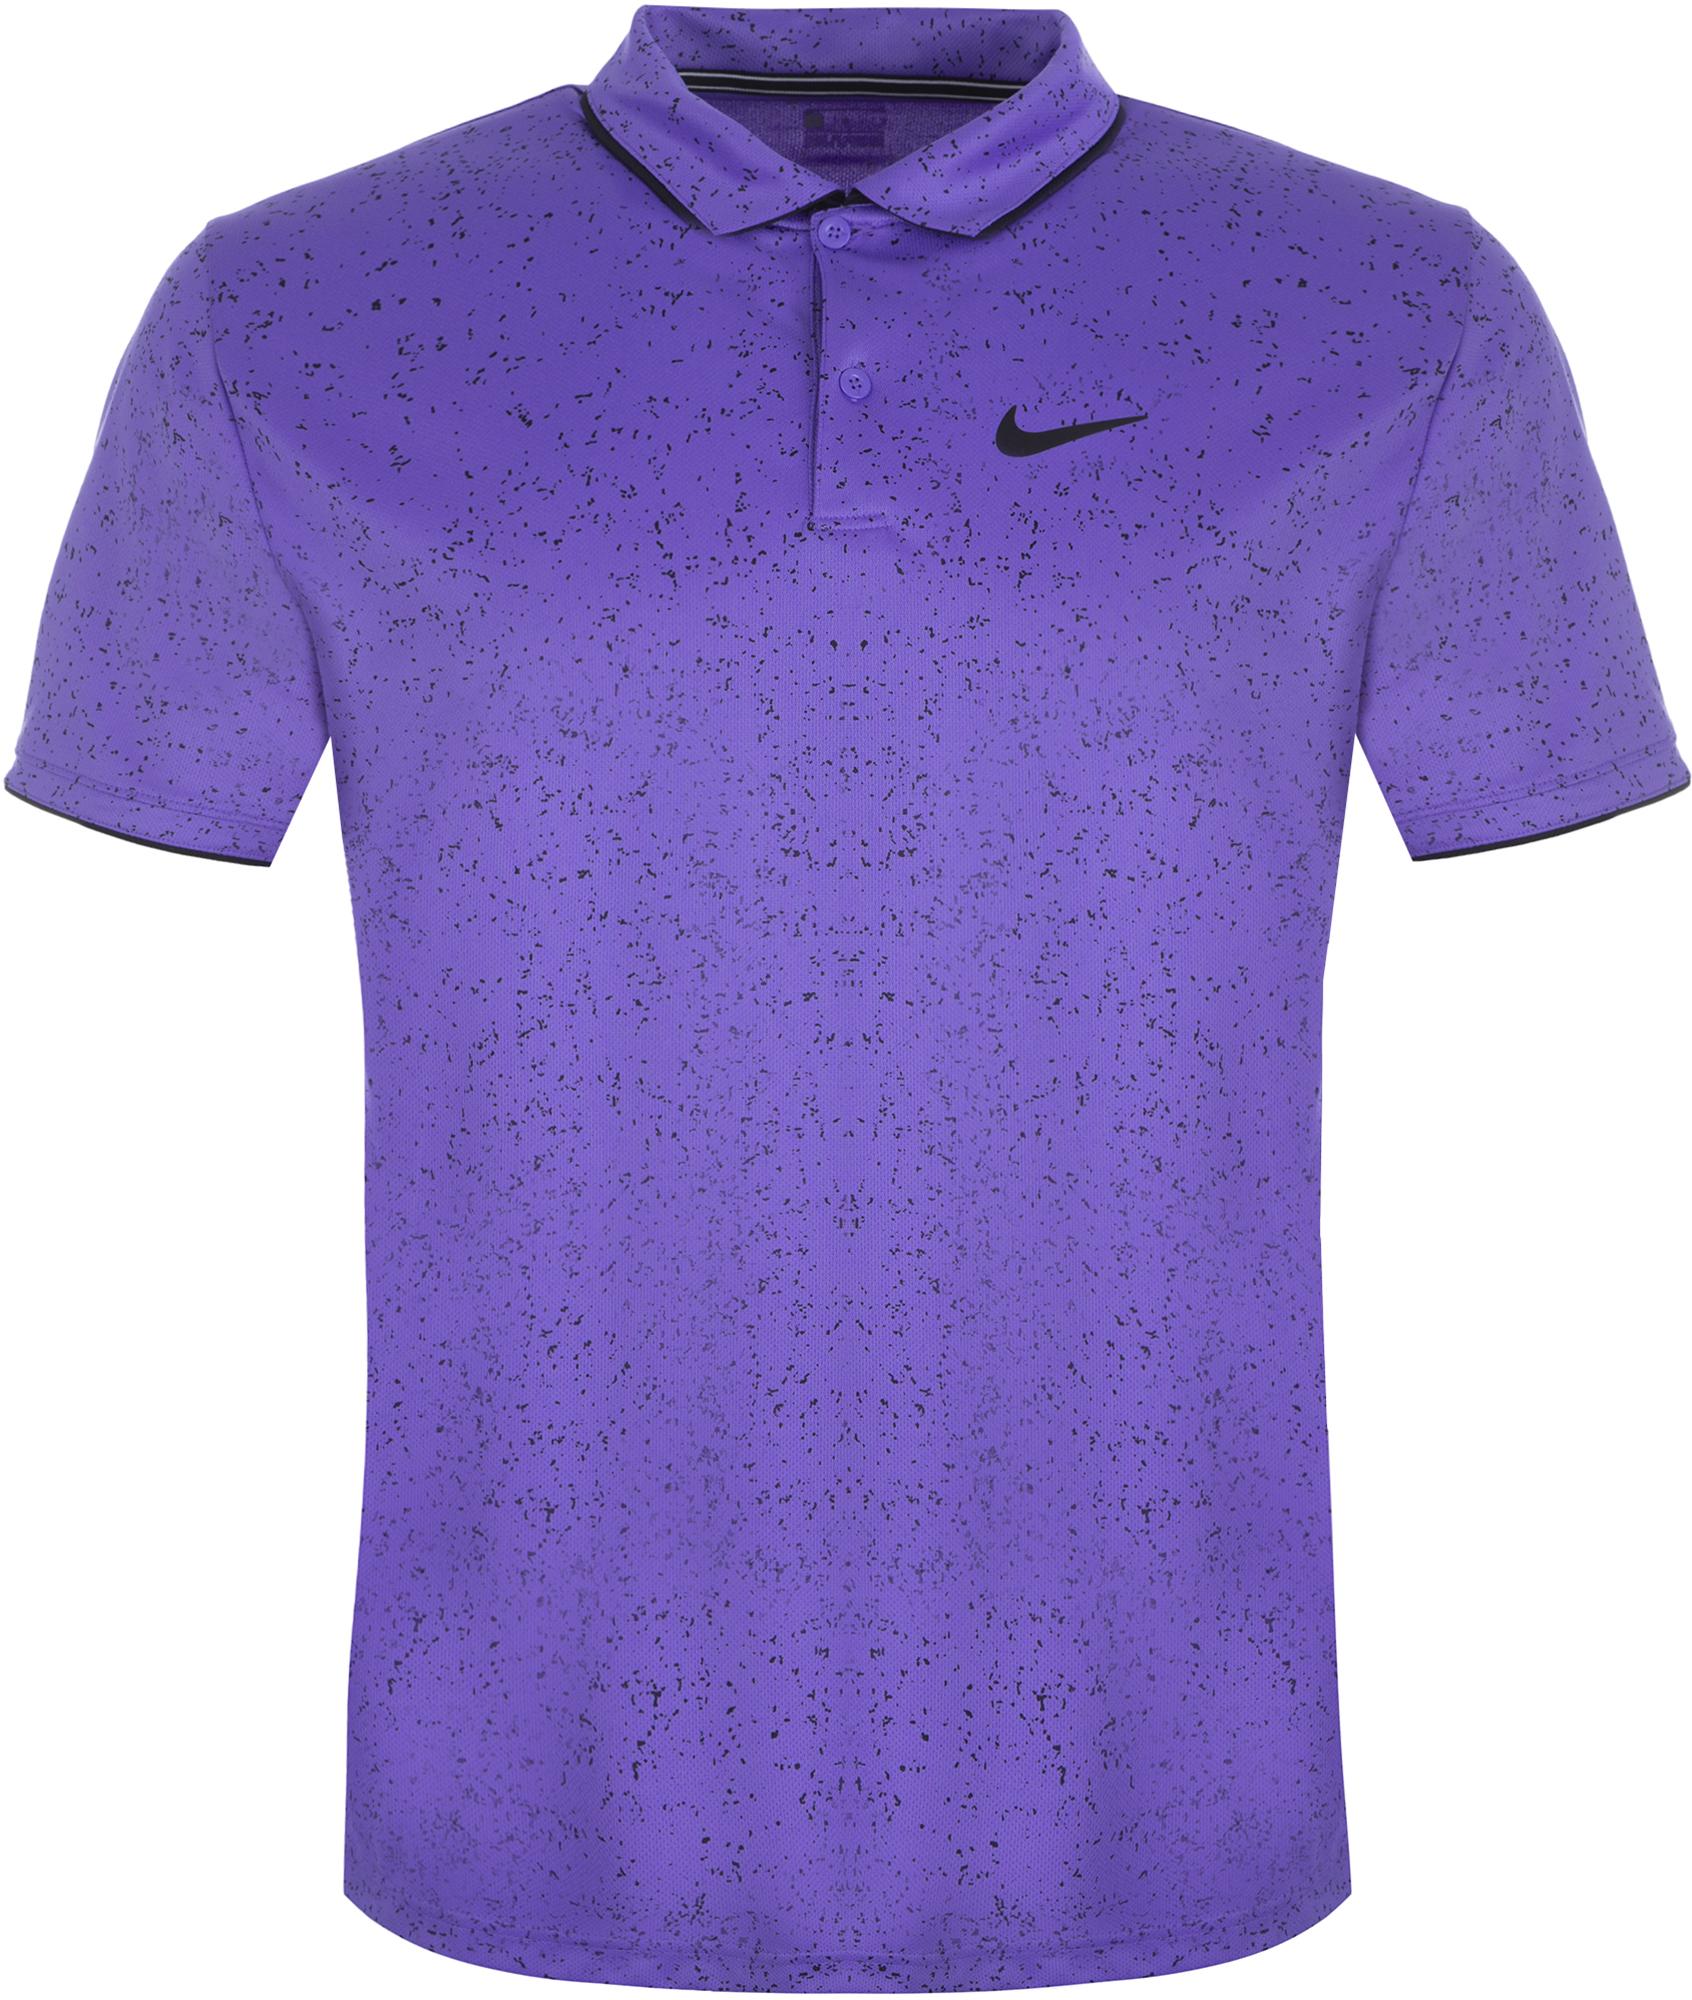 Nike Поло мужское Court Dry, размер 50-52